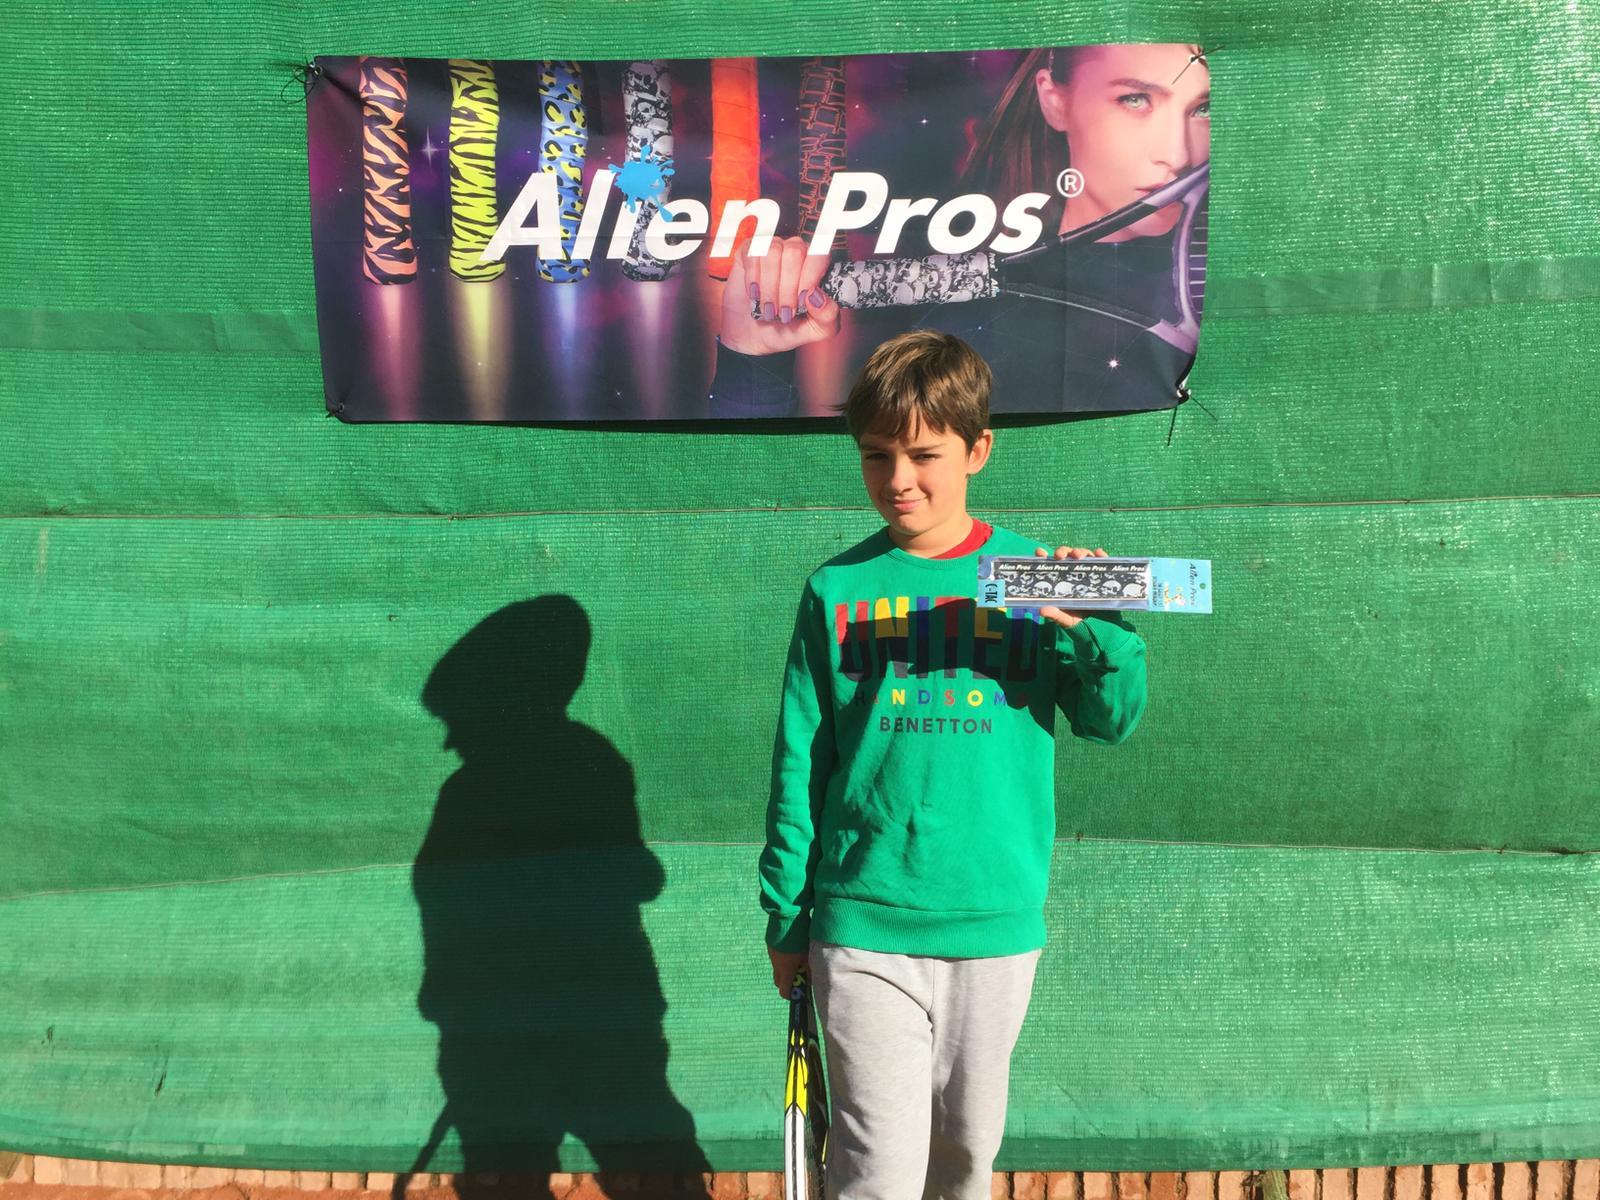 MBA-Tennis-Academy-Alien Pros Alumnos (9)